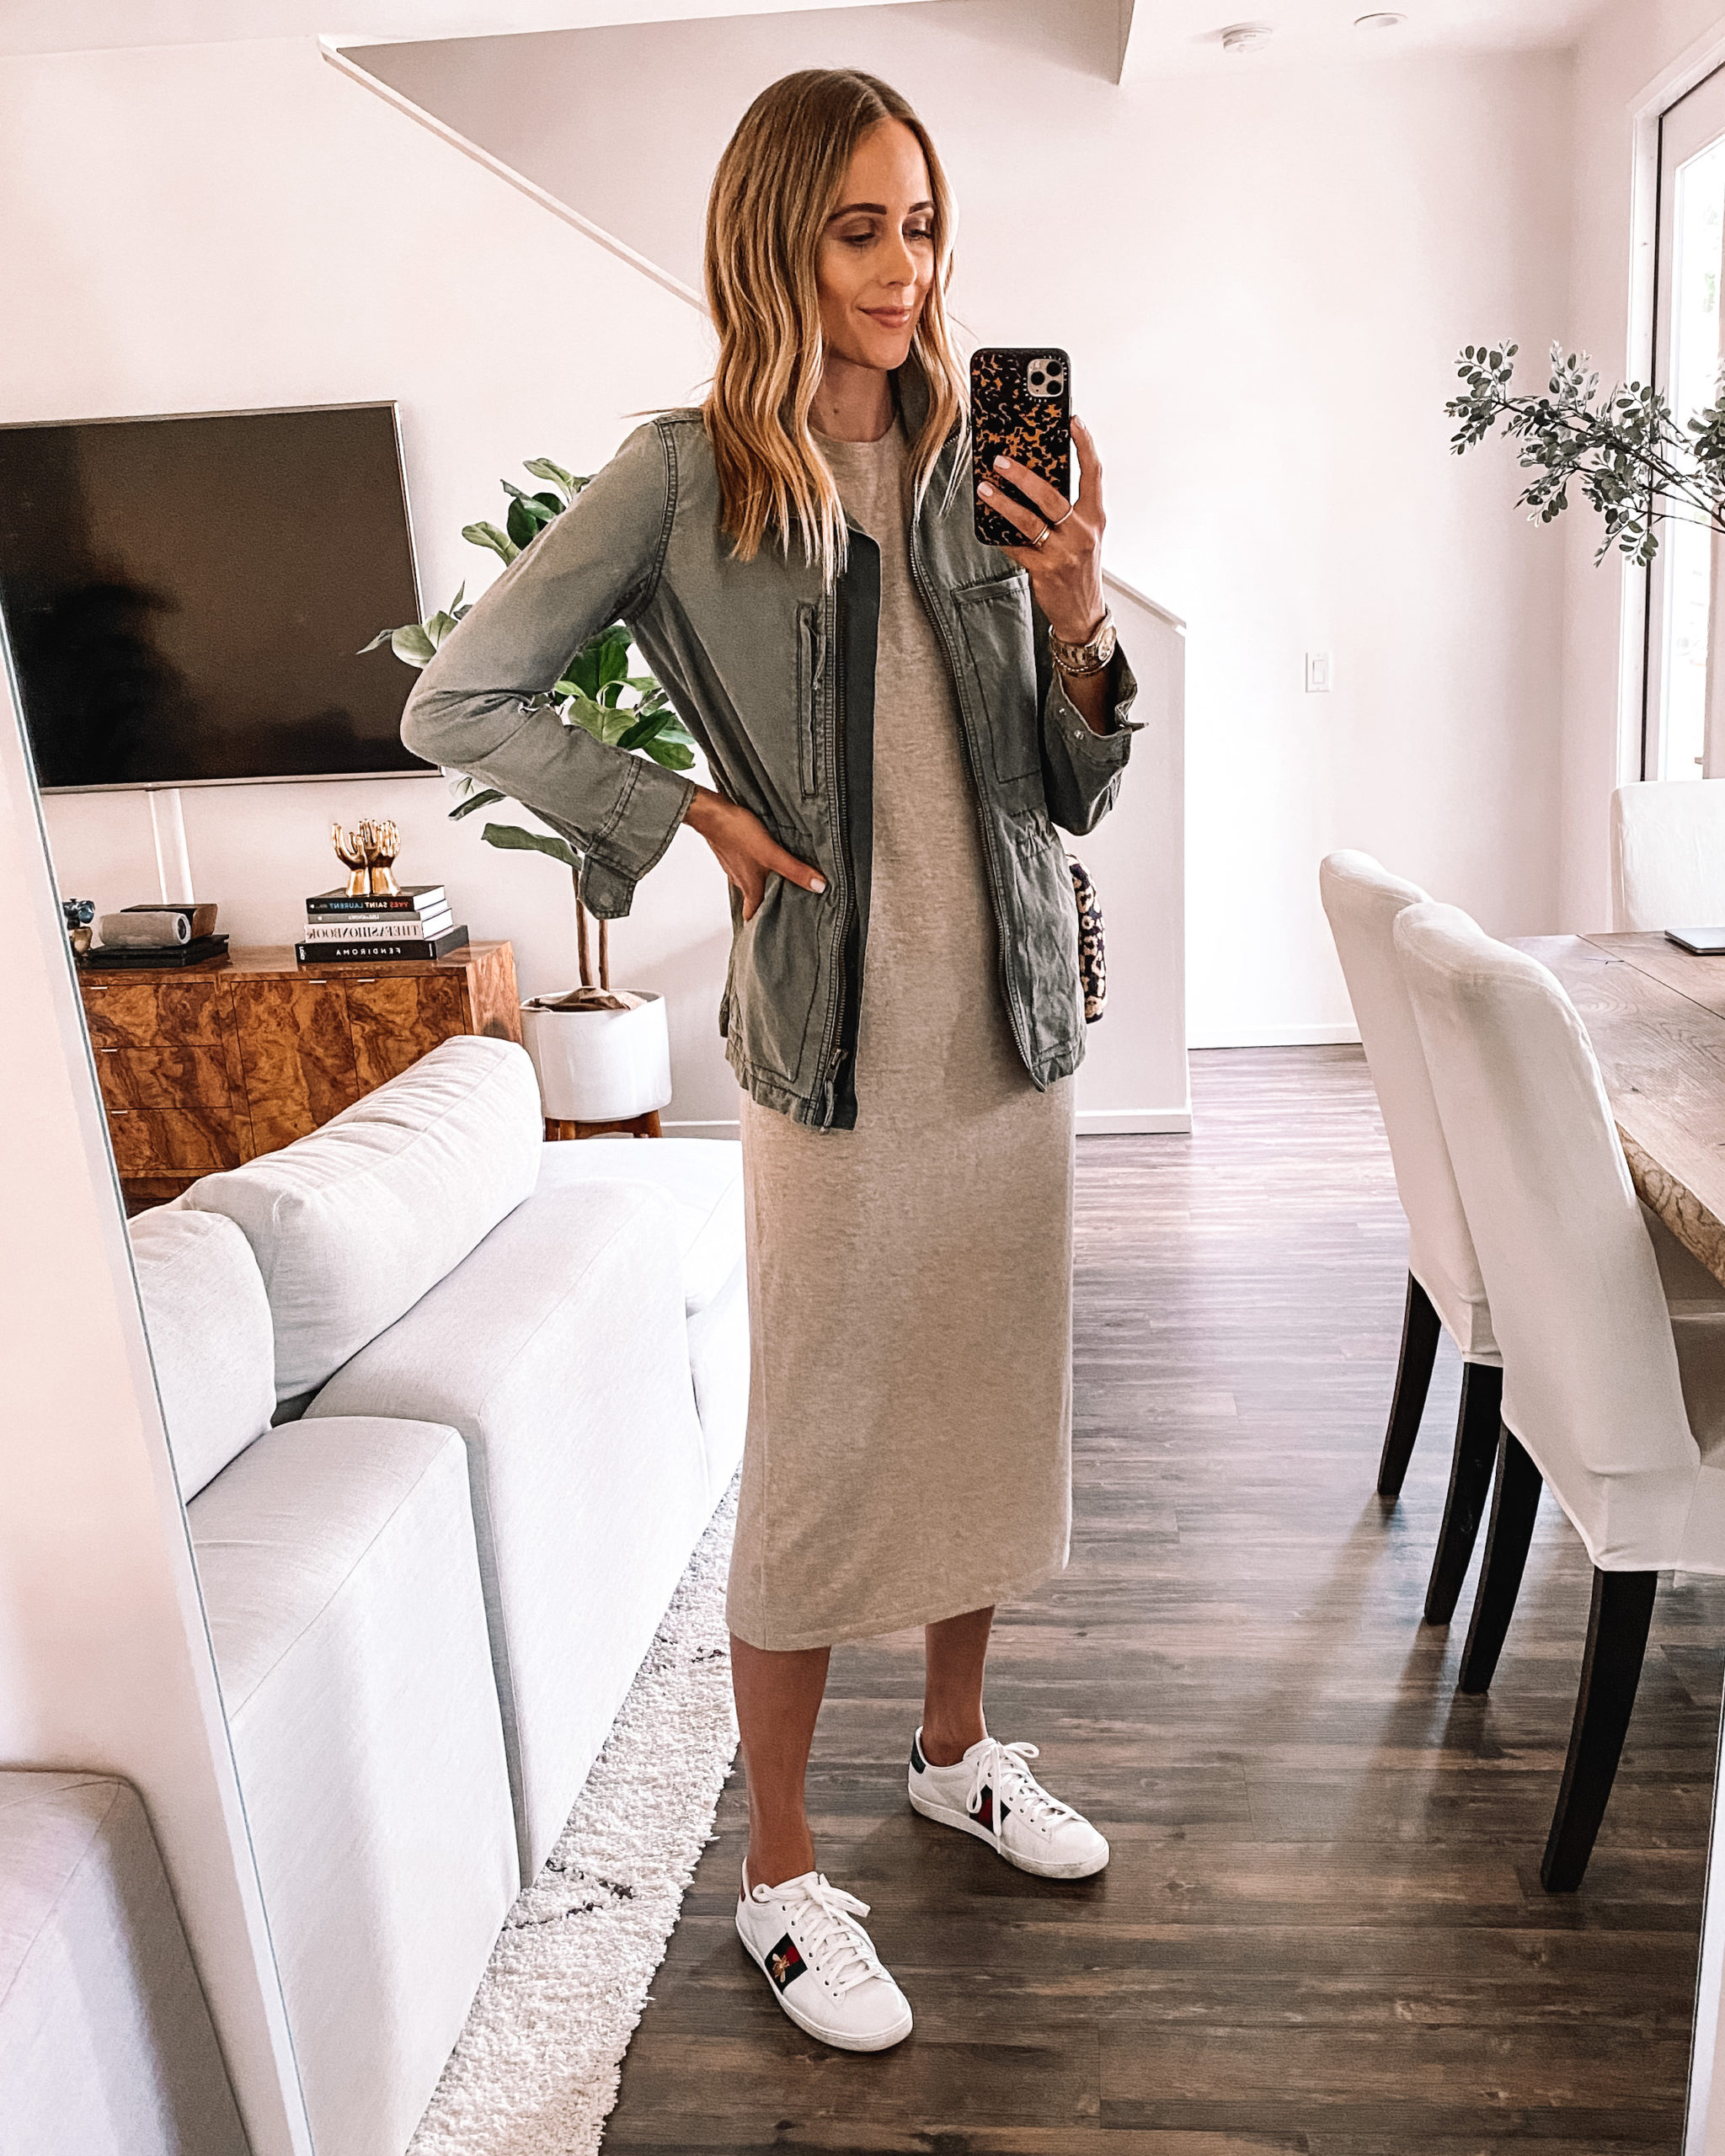 Fashion Jackson Wearing Jenni Kayne Tshirt Dress Green Utility Jacket Gucci Sneakers